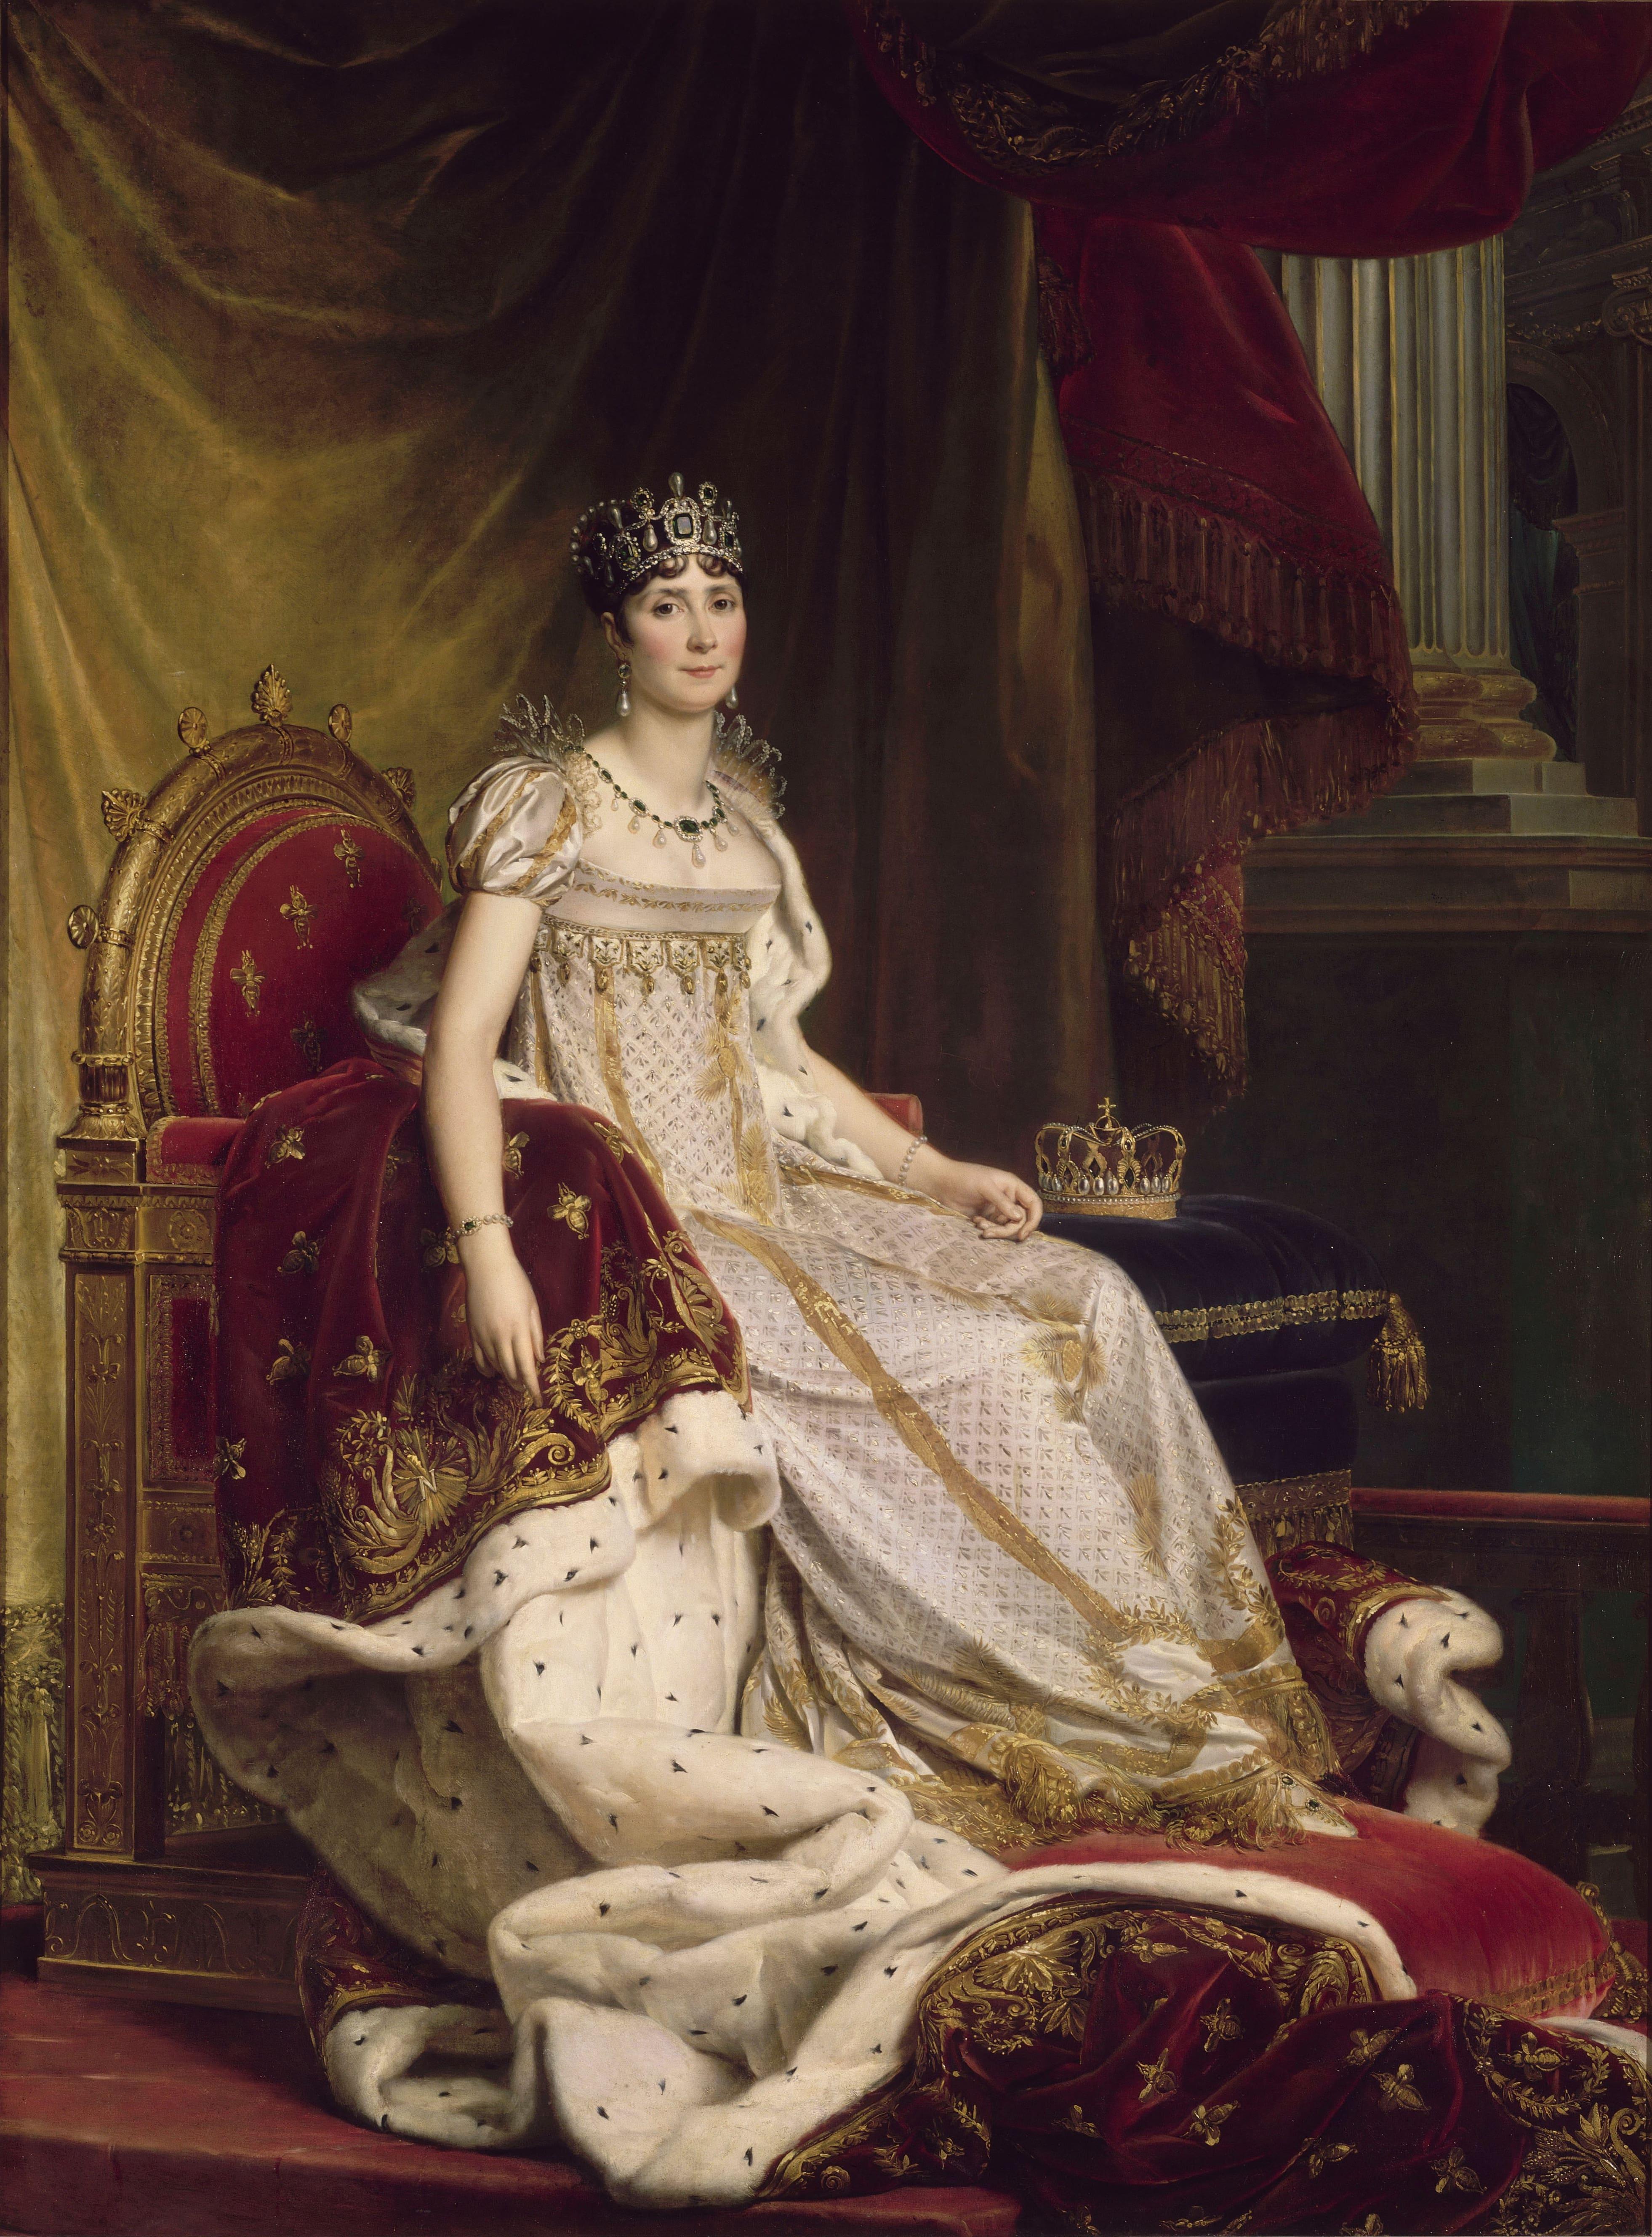 Depiction of Josefina de Beauharnais